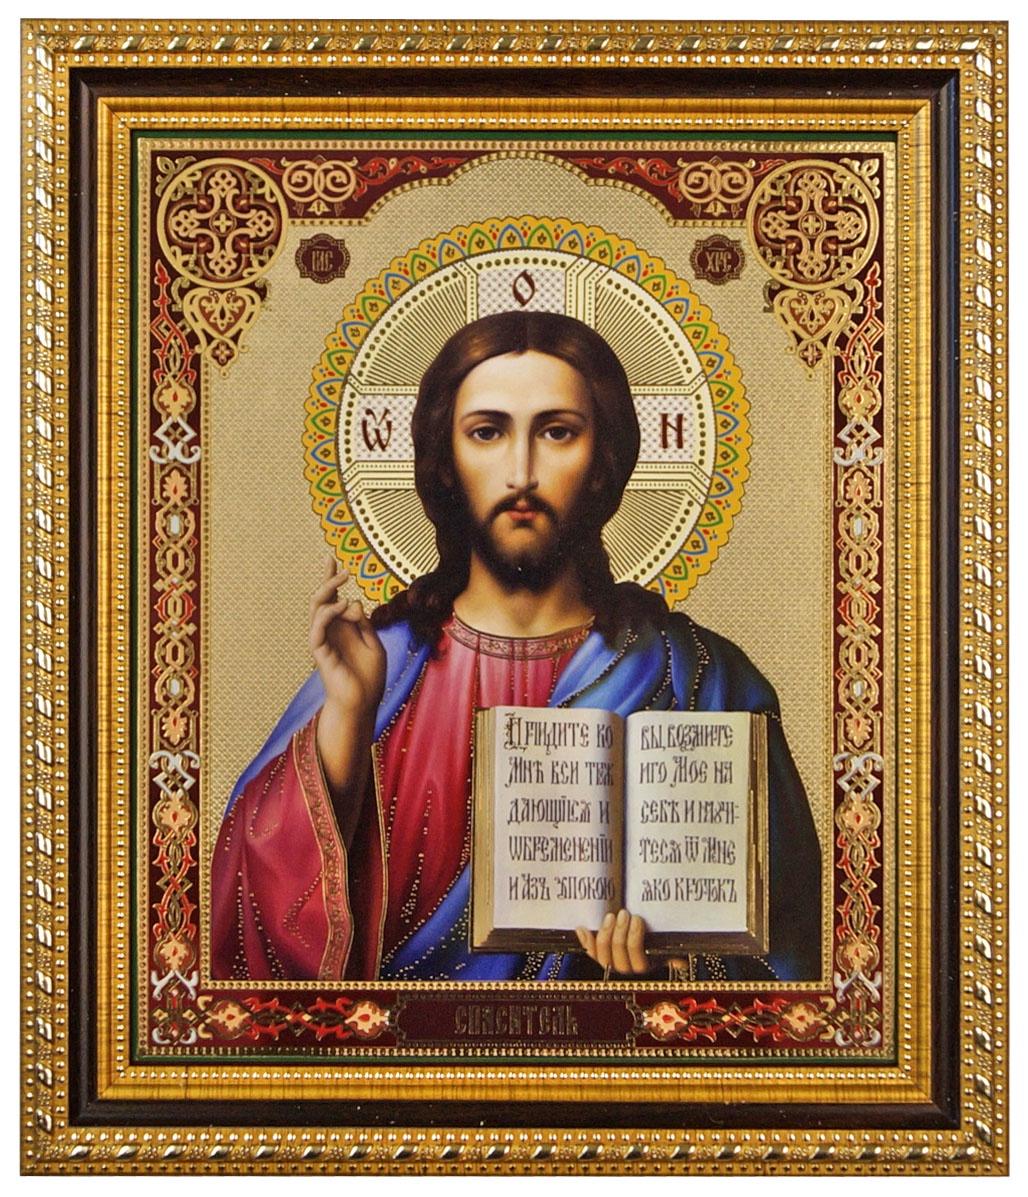 Икона Мастер Рио Христа Спасителя, Пластик икона navell